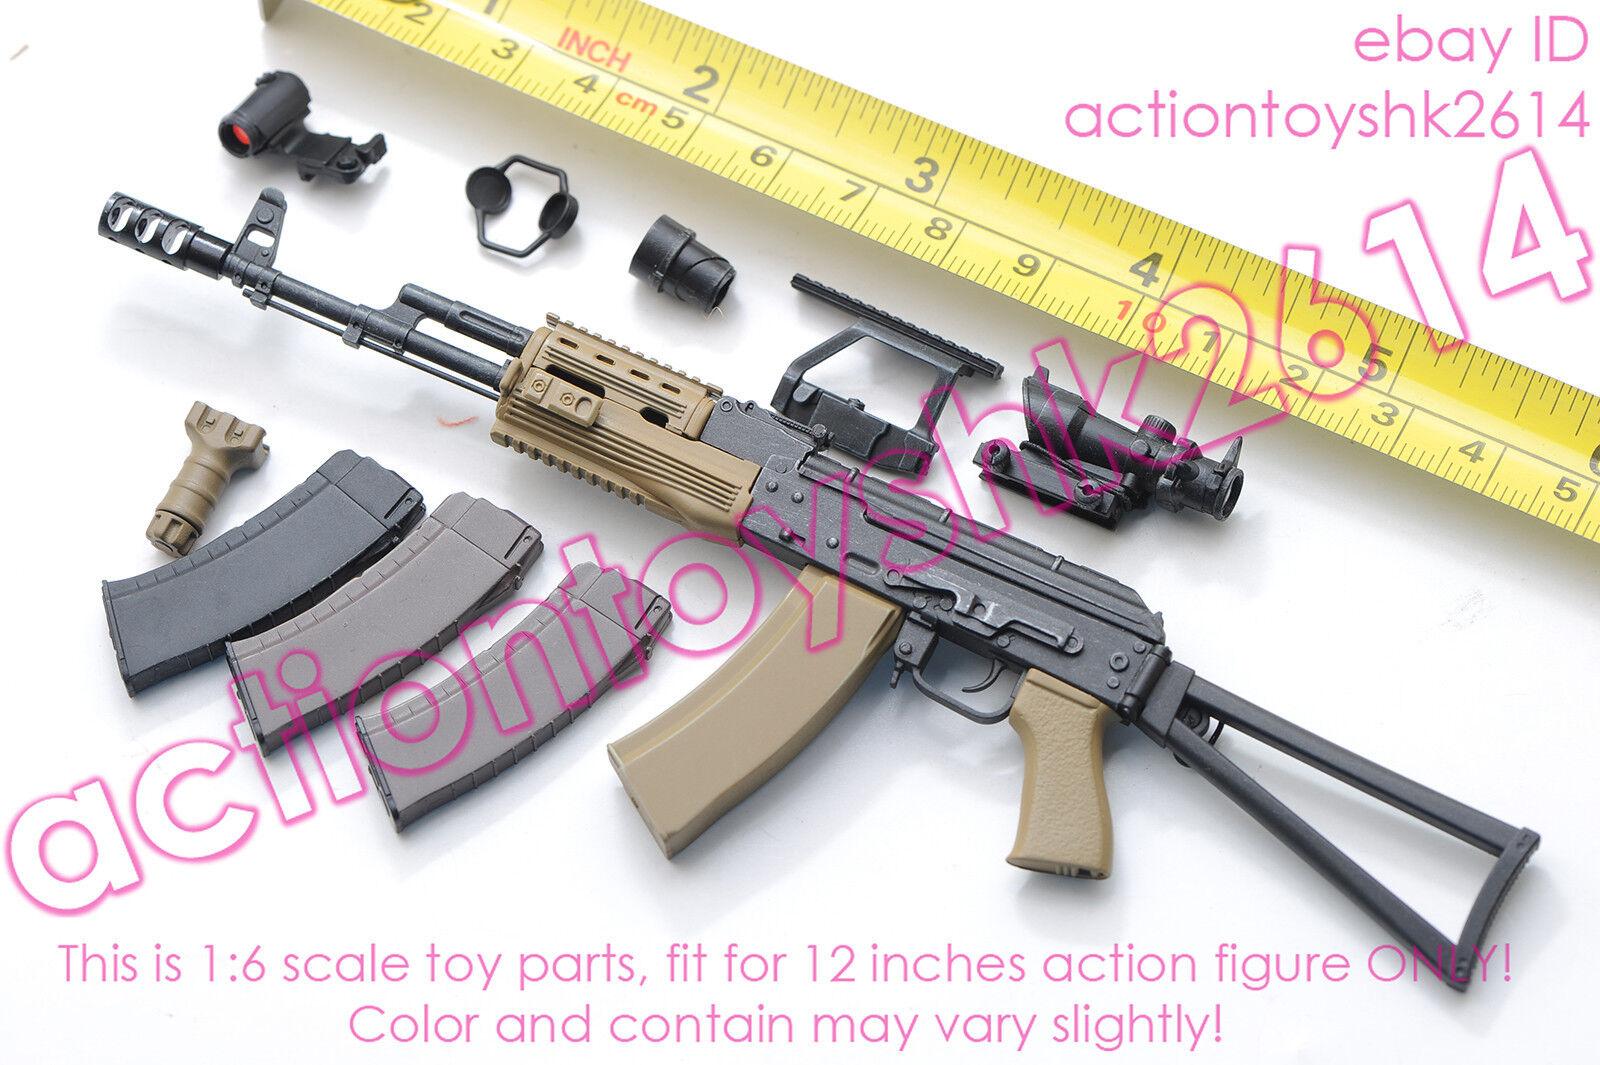 1/6 Scale VTS Toys VM-018 THE DARKZONE AGENT RENEGADE - AK74M